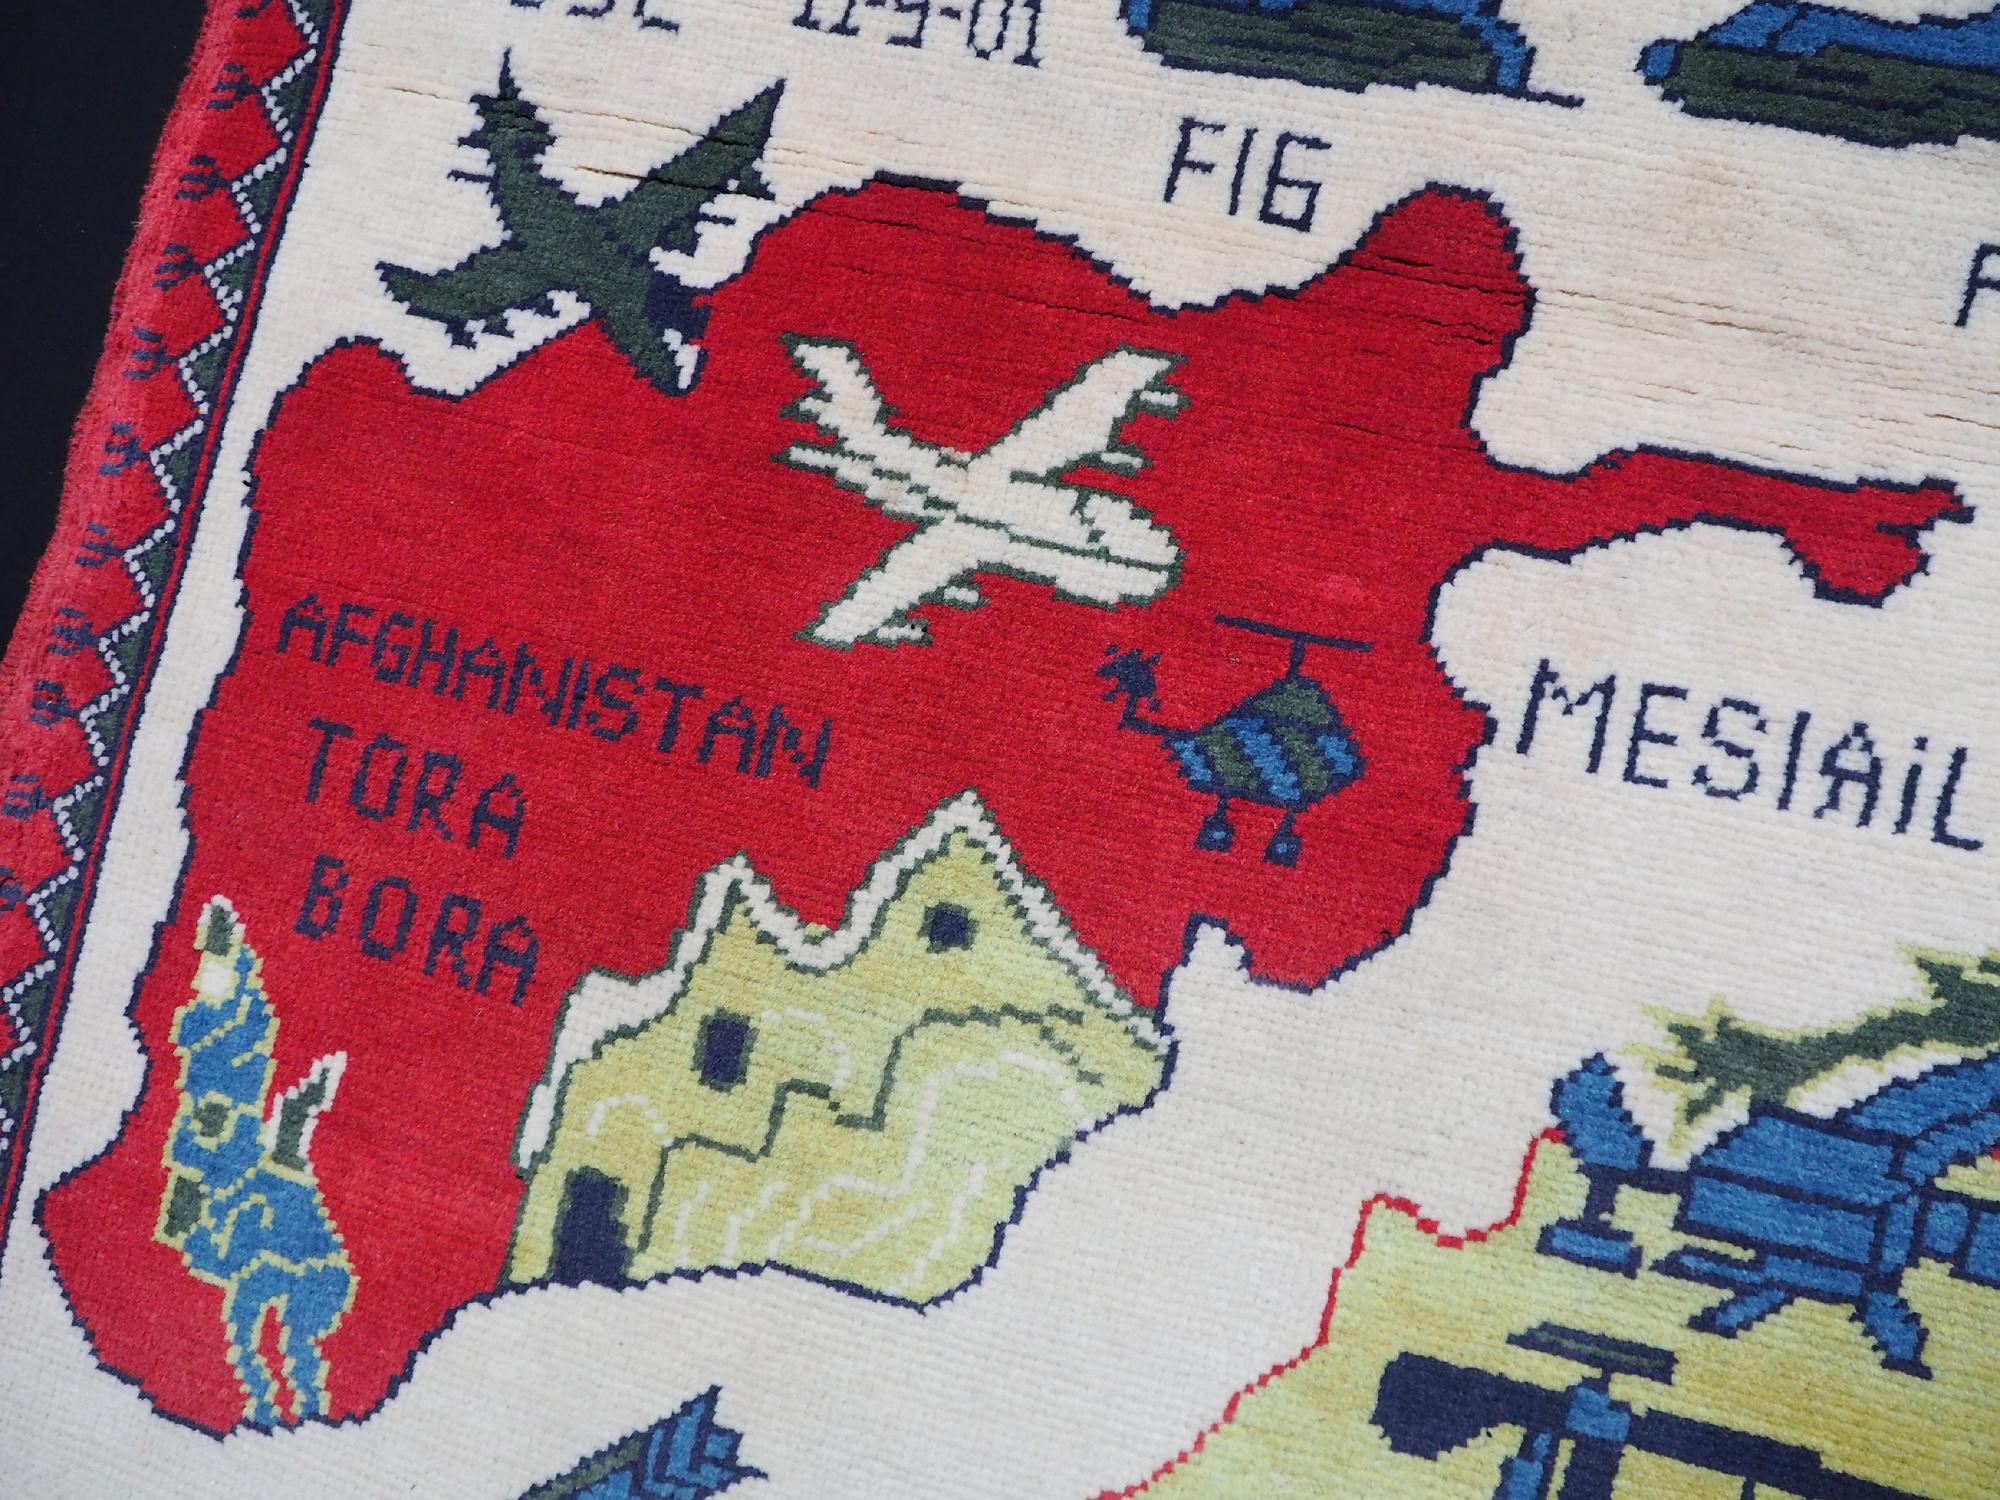 130x82 cm Afghanistan U.S.A 11 september 2001 Newyork world trade center afghan kriegteppich war rug wandteppich orientteppich Nr- WTC 21C